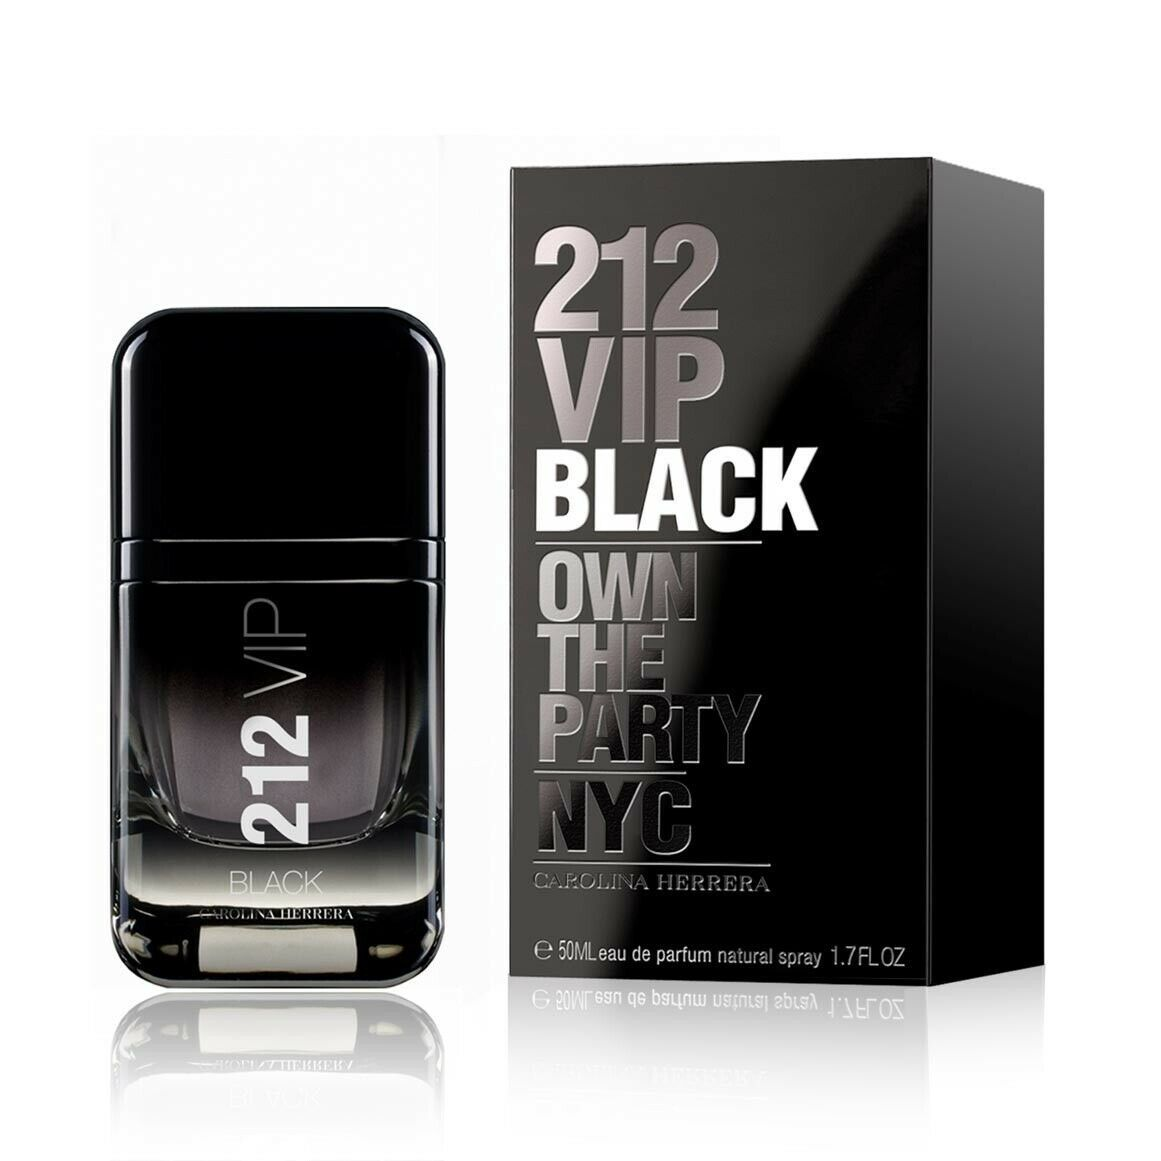 212 Vip Negro por Carolina Herrera (M) Eau de Parfum 50ml Spray - $54.03